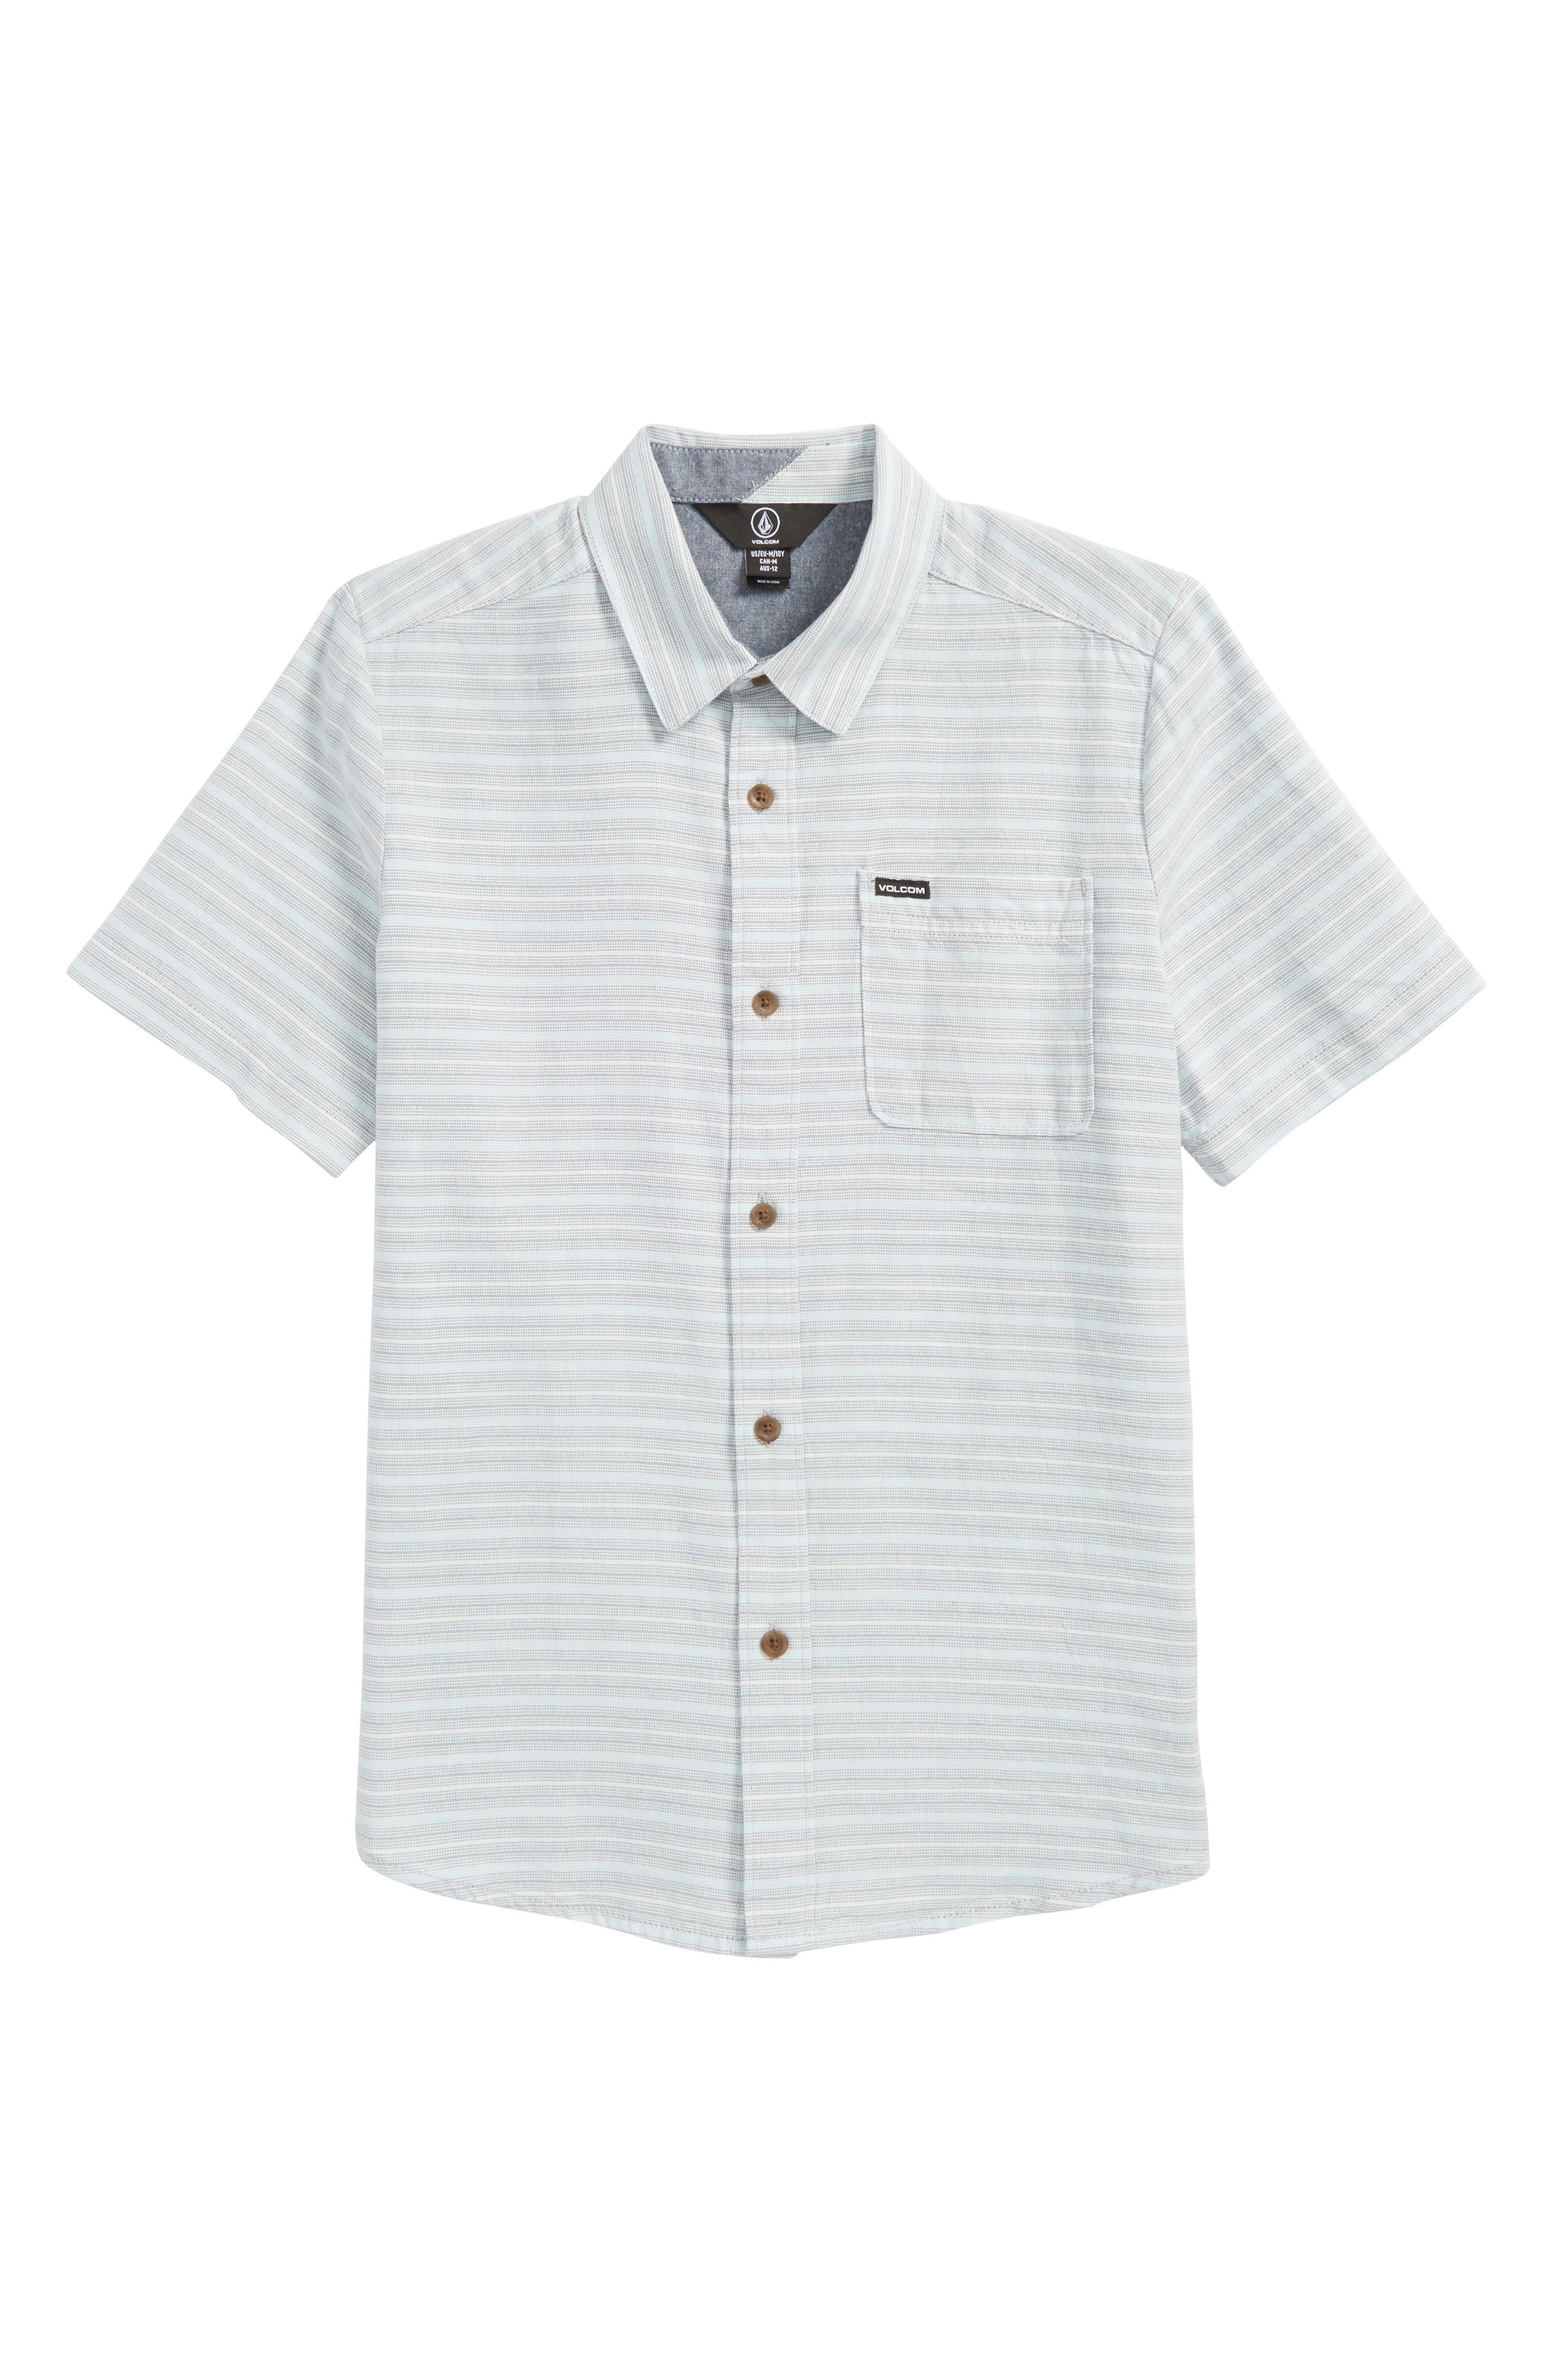 Eastport Basket Weave Shirt,                         Main,                         color, Wrecked Indigo